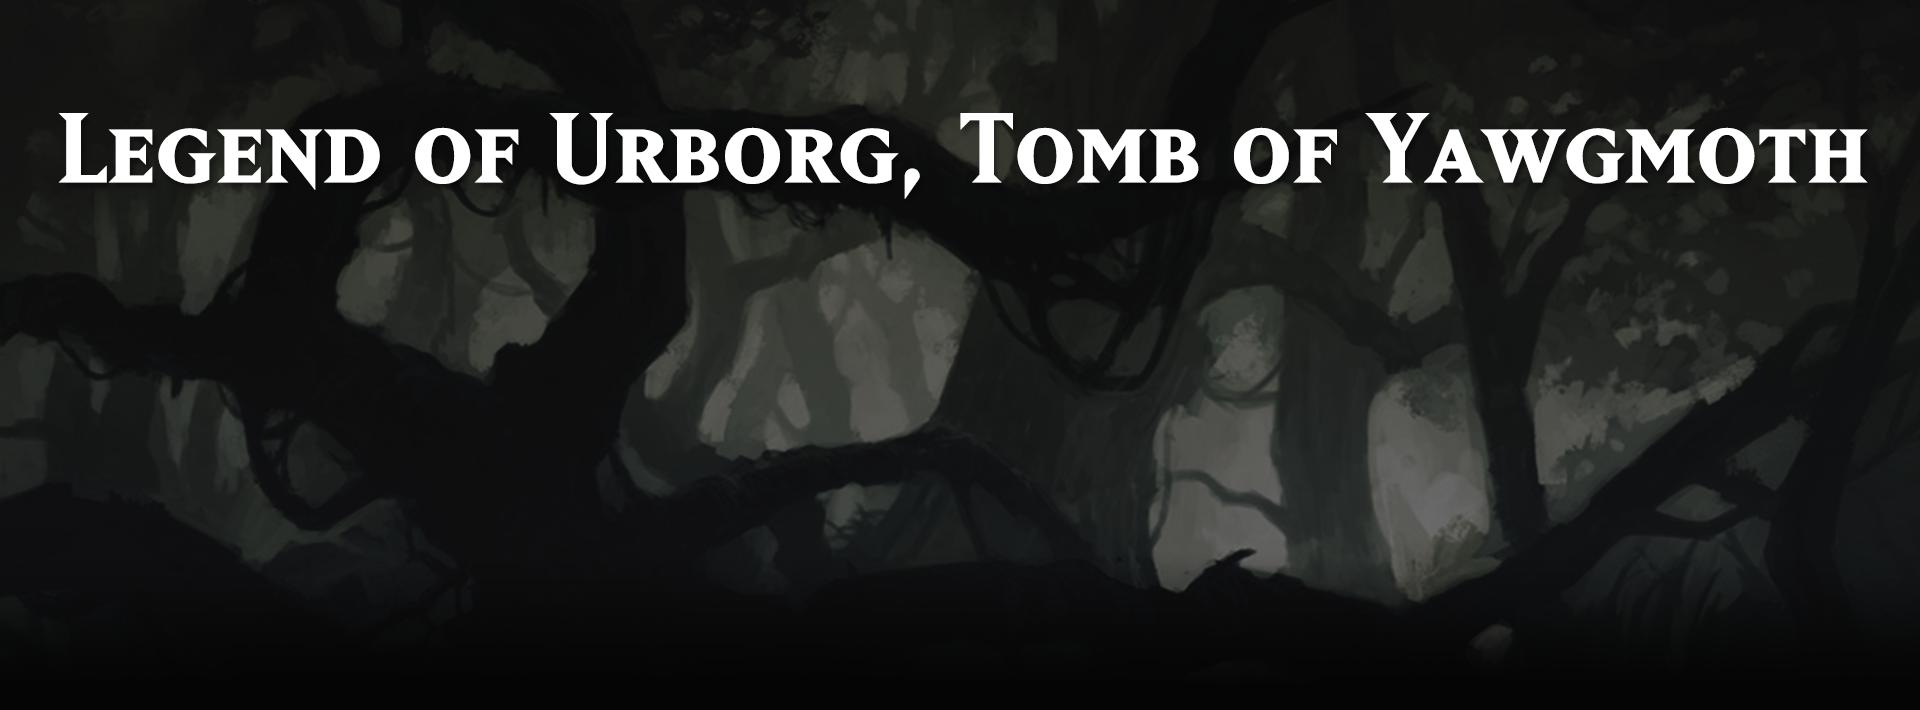 Legend of Urborg, Tomb of Yawgmoth